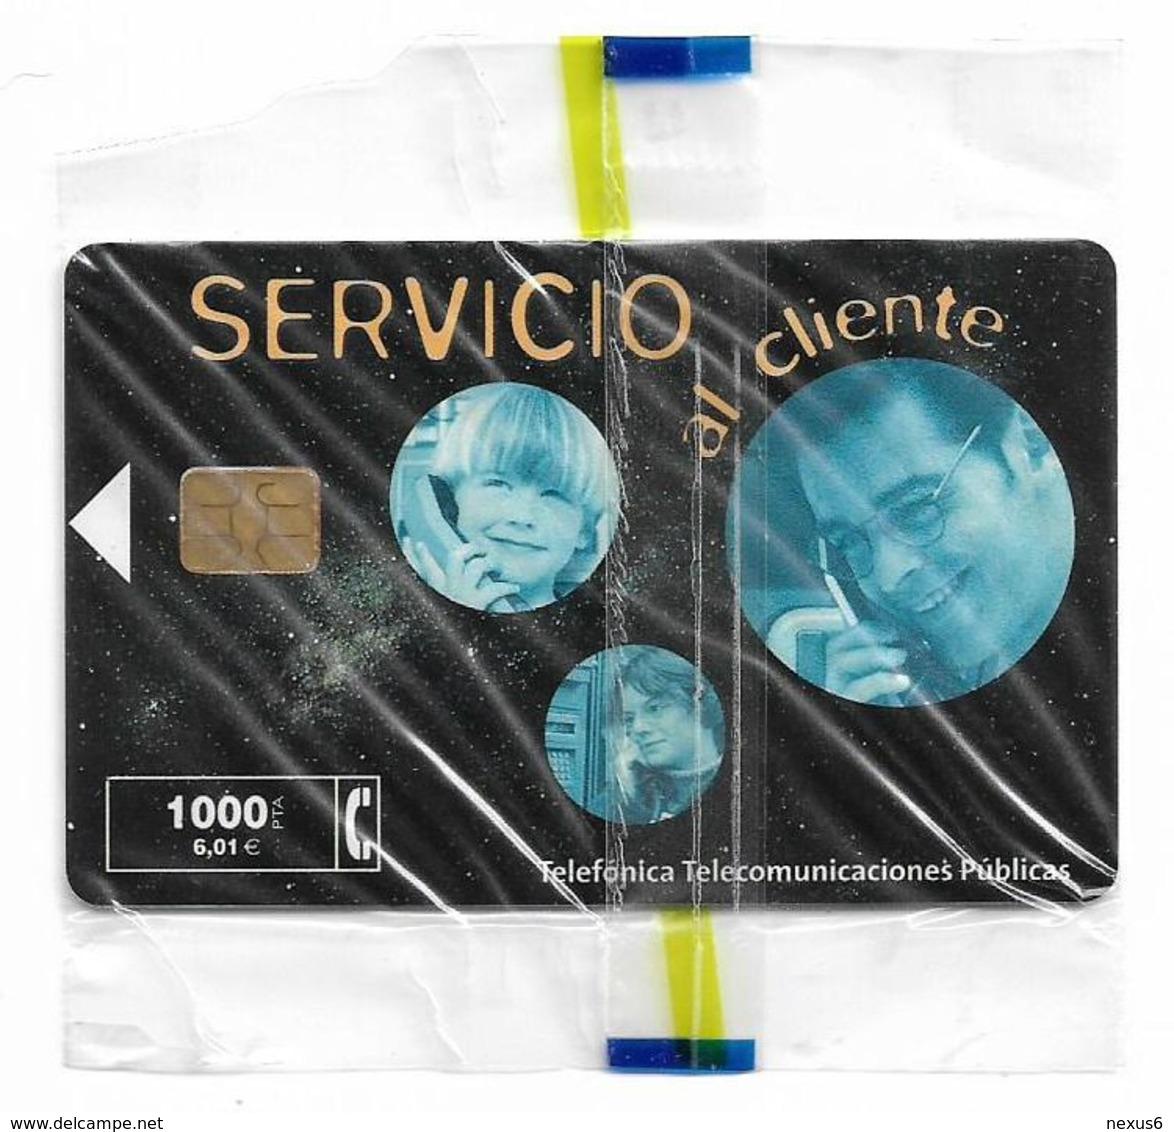 Spain - Telefonica - Servicio Al Cliente VIIIa - P-451A - 02.2001, 26.500ex, NSB - Espagne